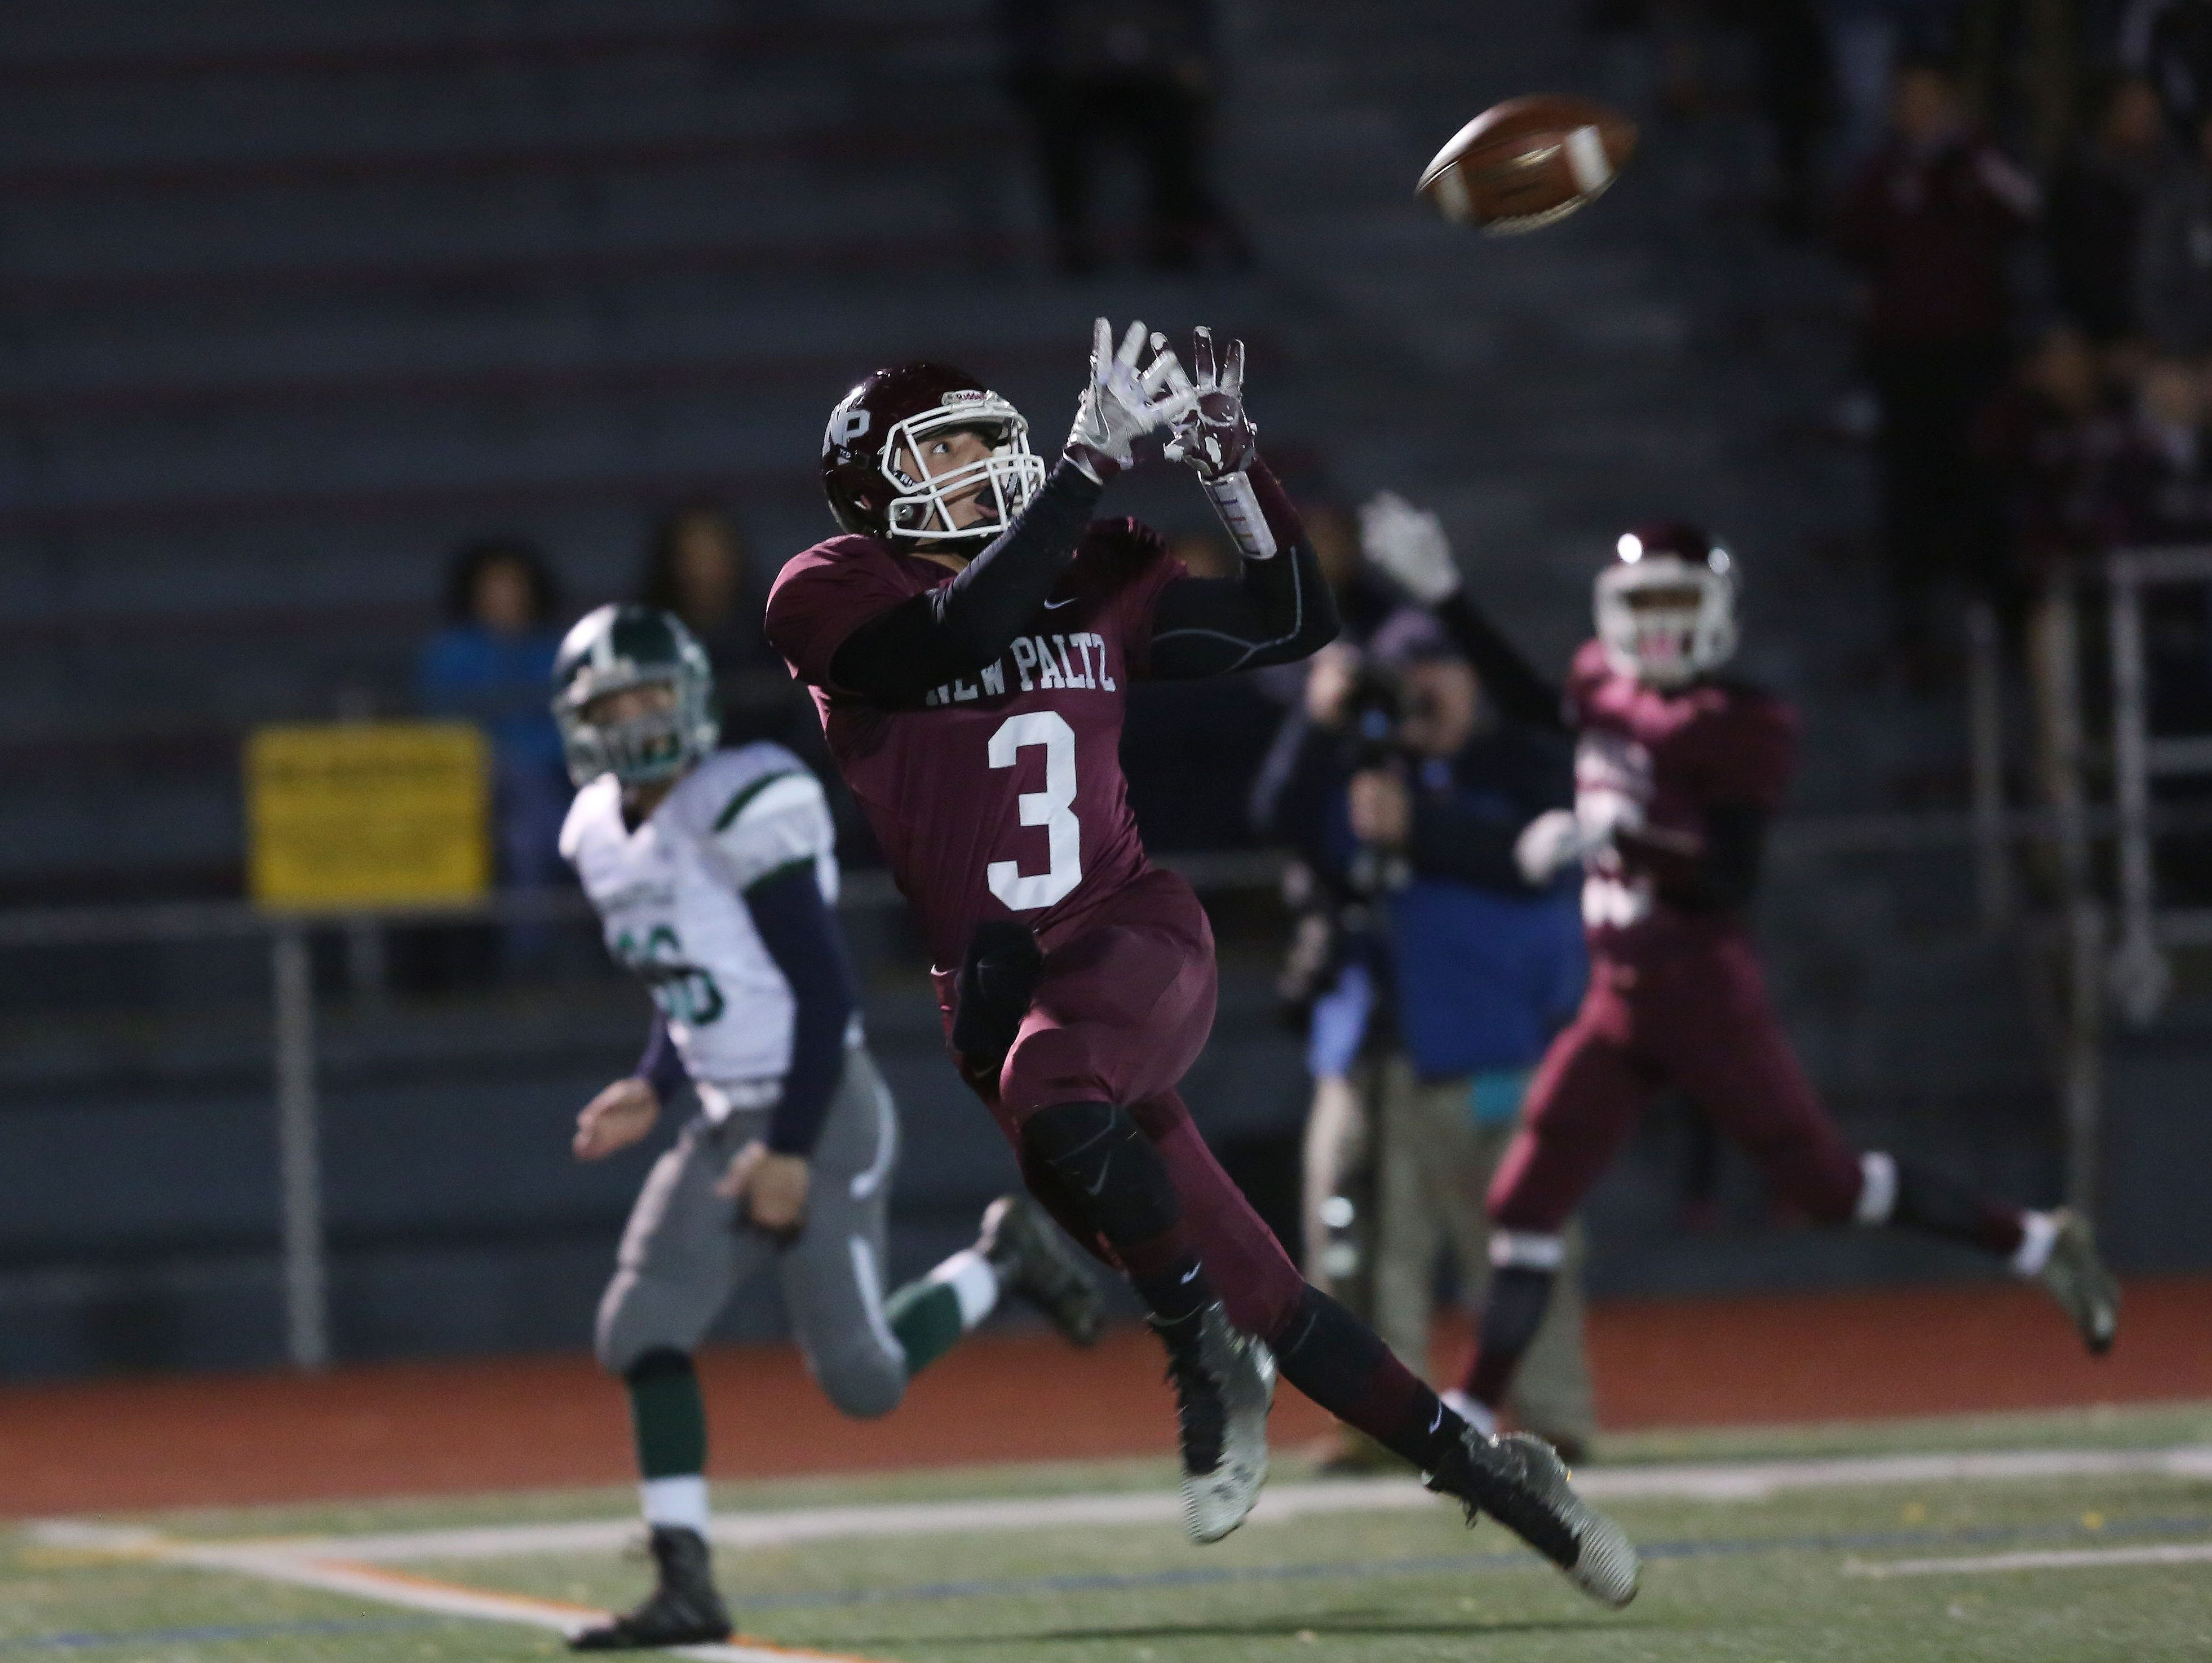 New Paltz's Joseph DiMarco (3) catches a first quarter touchdown pass against Pleasantville in the Class B regional semifinal football game at Dietz Stadium in Kingston Nov. 11, 2016